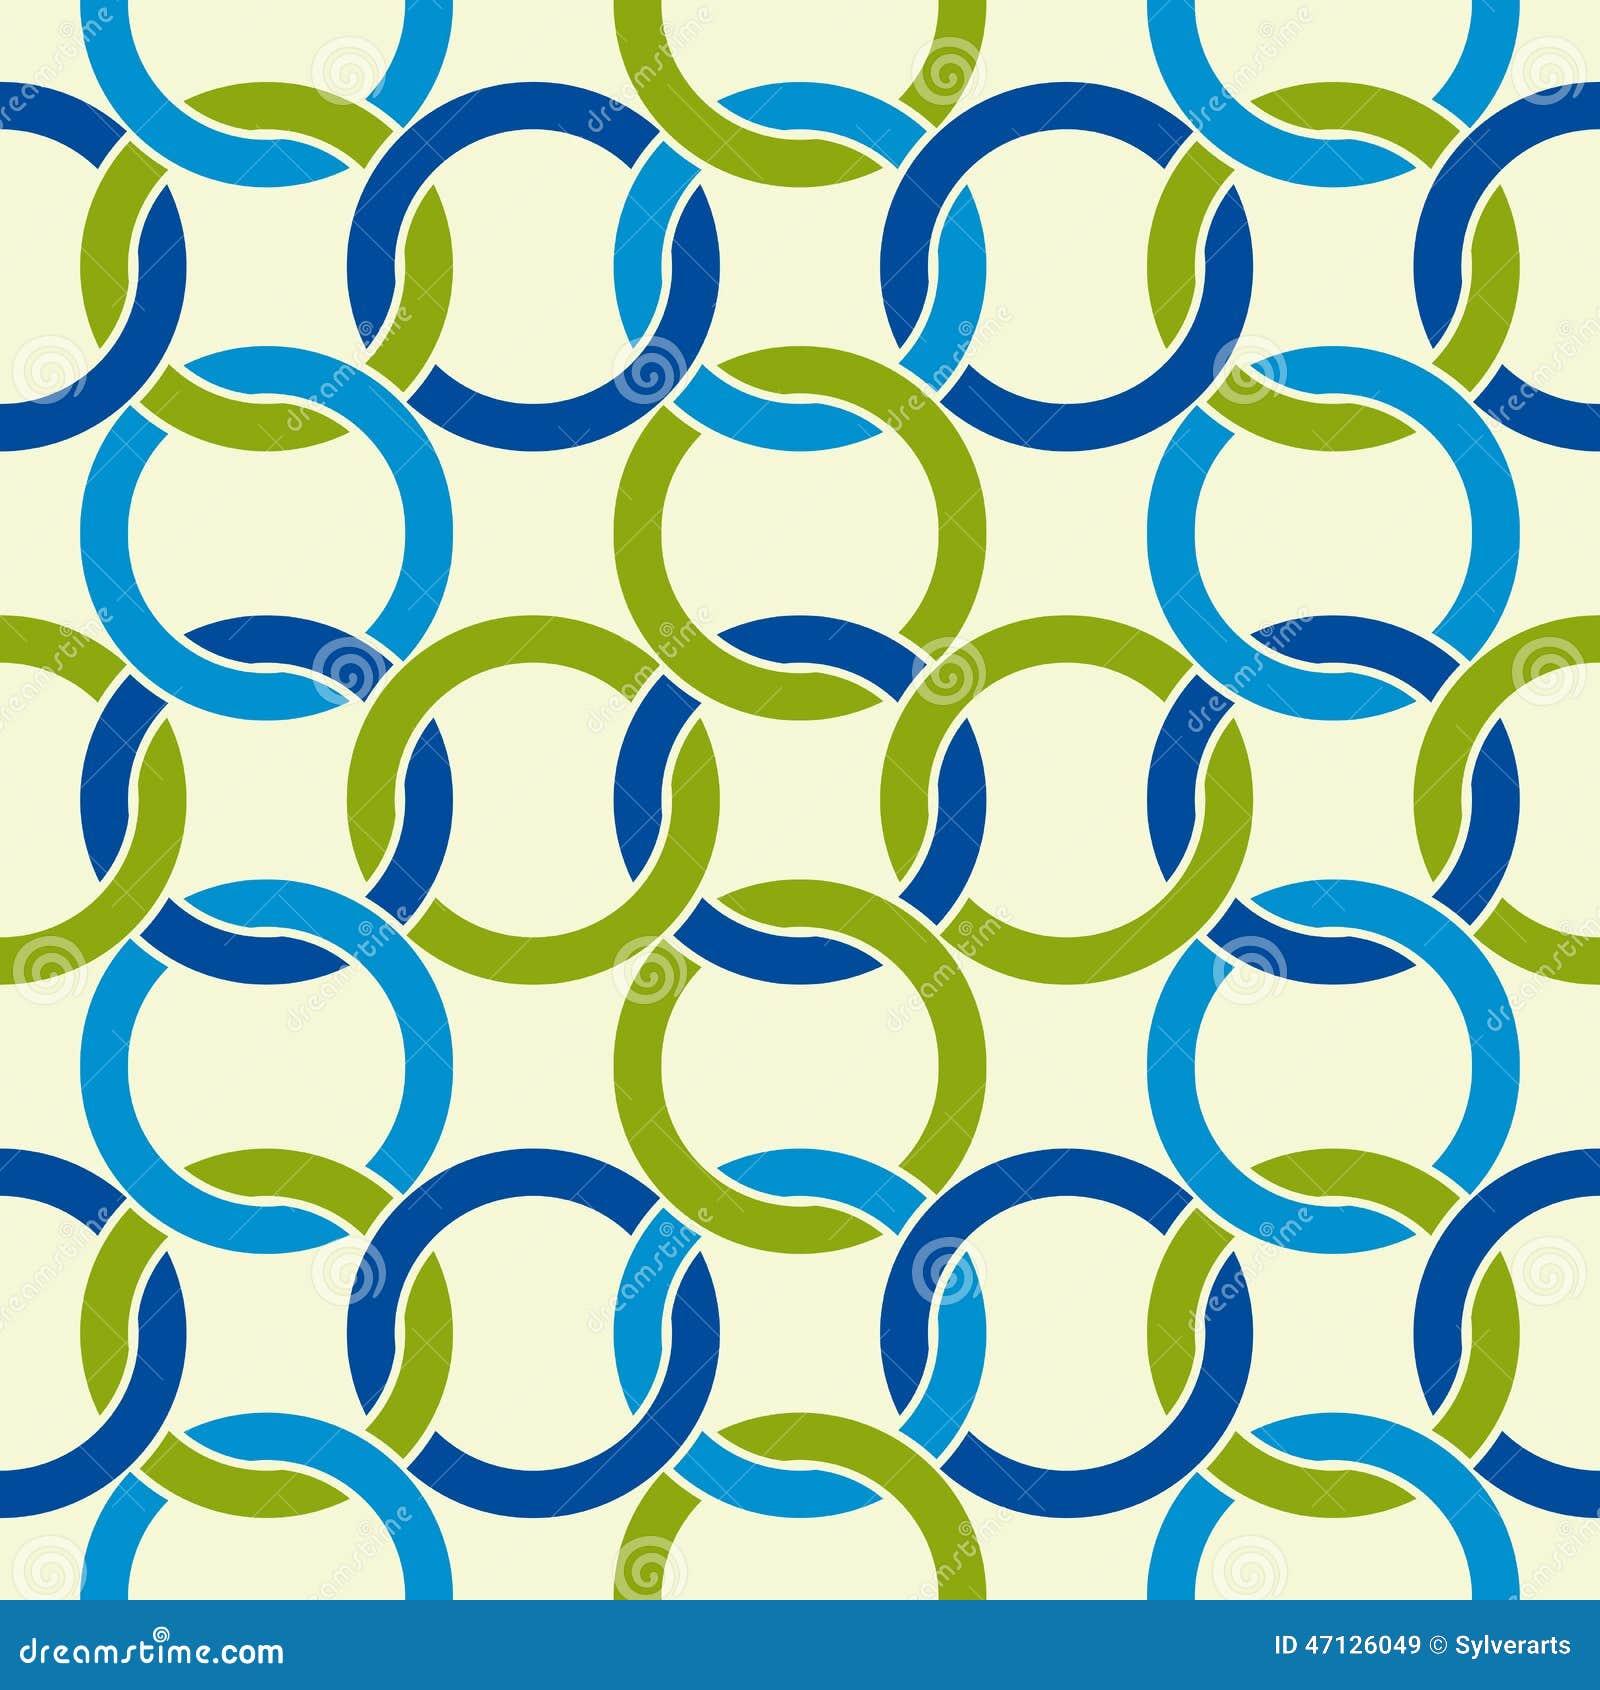 Round shapes lattice seamless pattern.